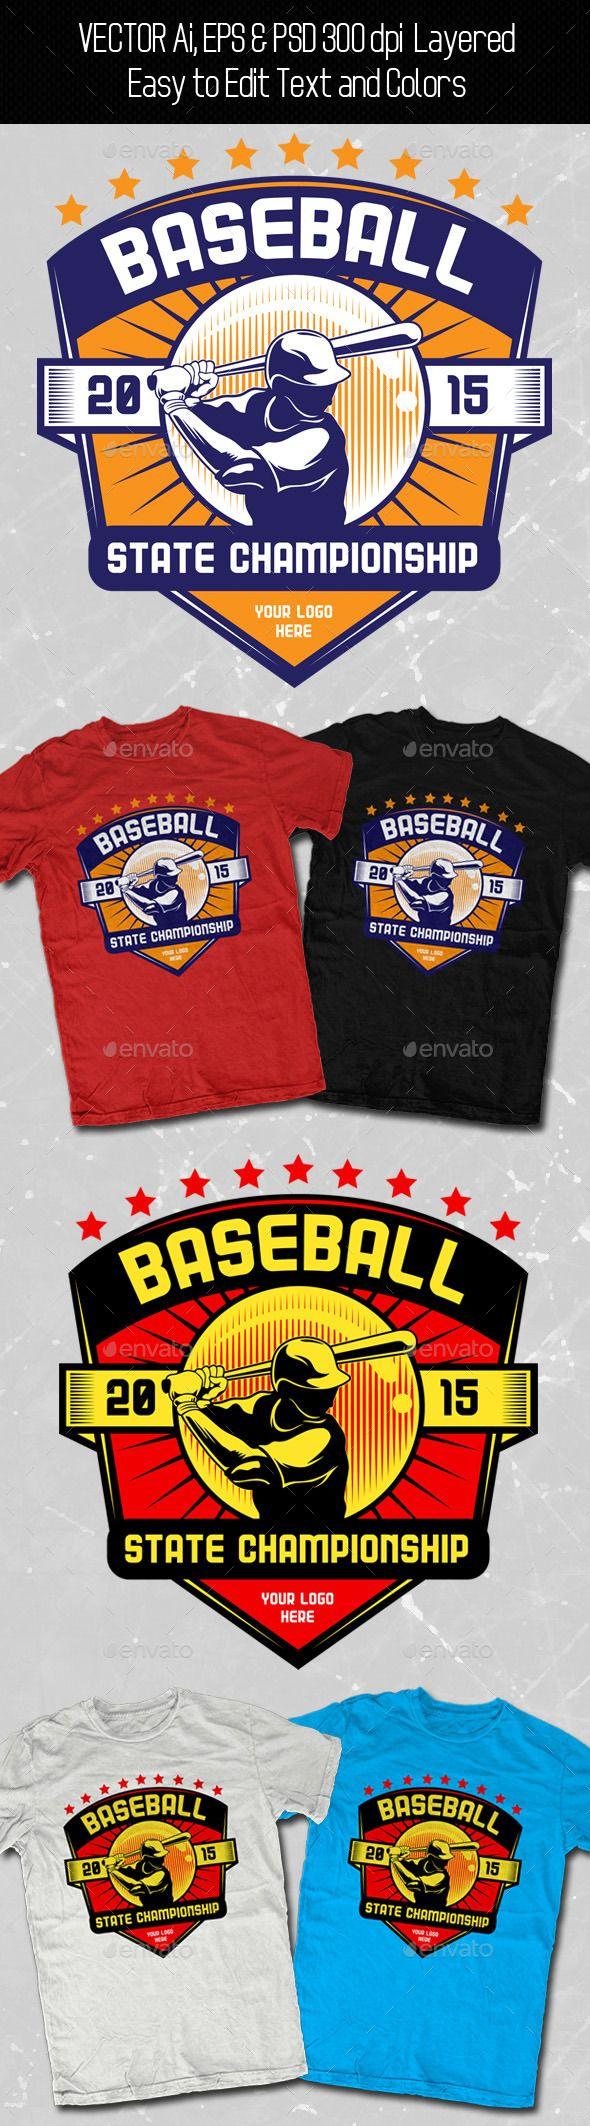 1000+ Ideas About Baseball T Shirt Designs On Pinterest | Baseball